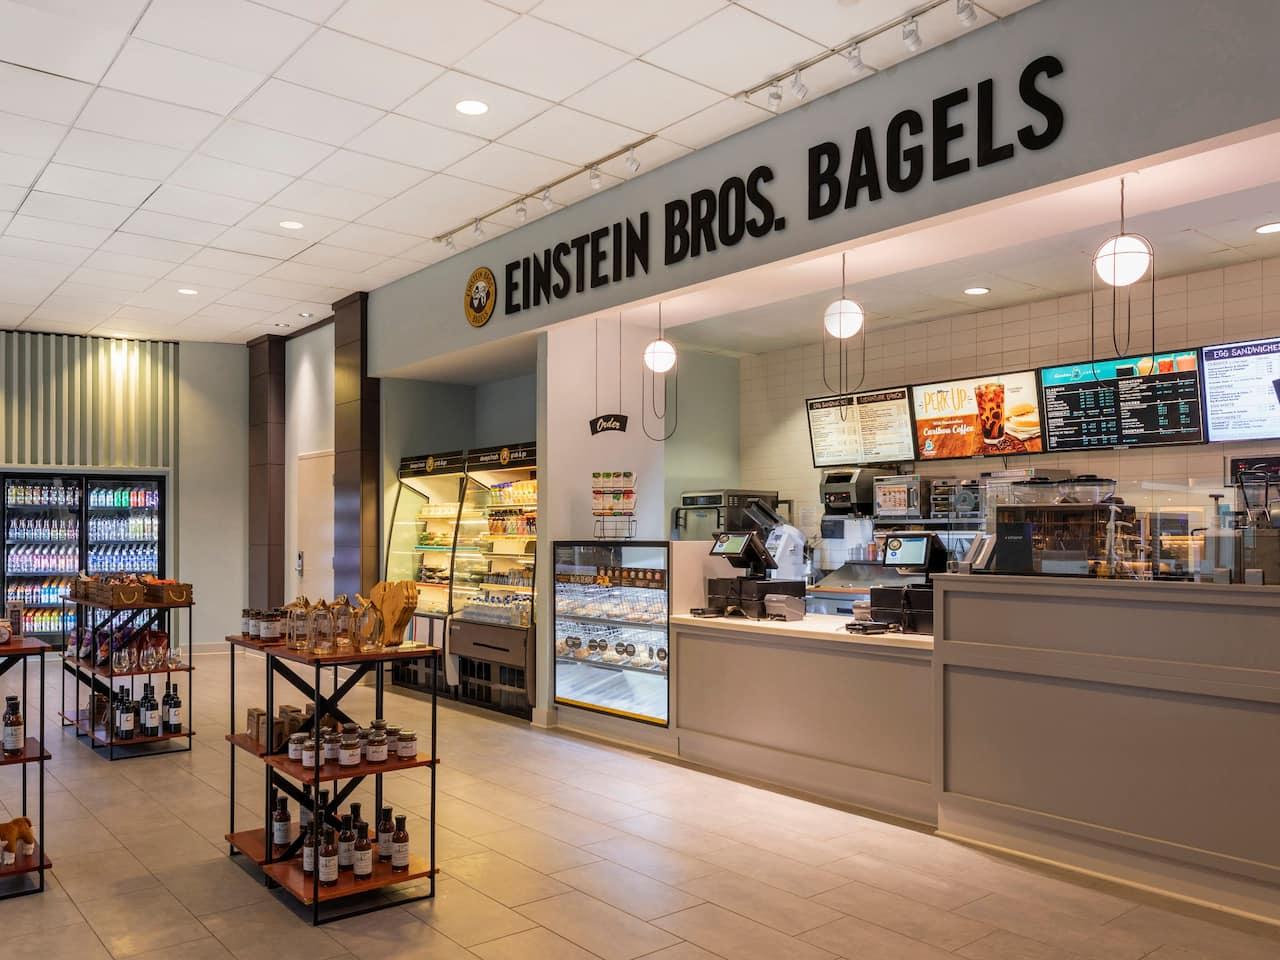 Hyatt Regency Houston Einstein Bros. Bagels Entrance